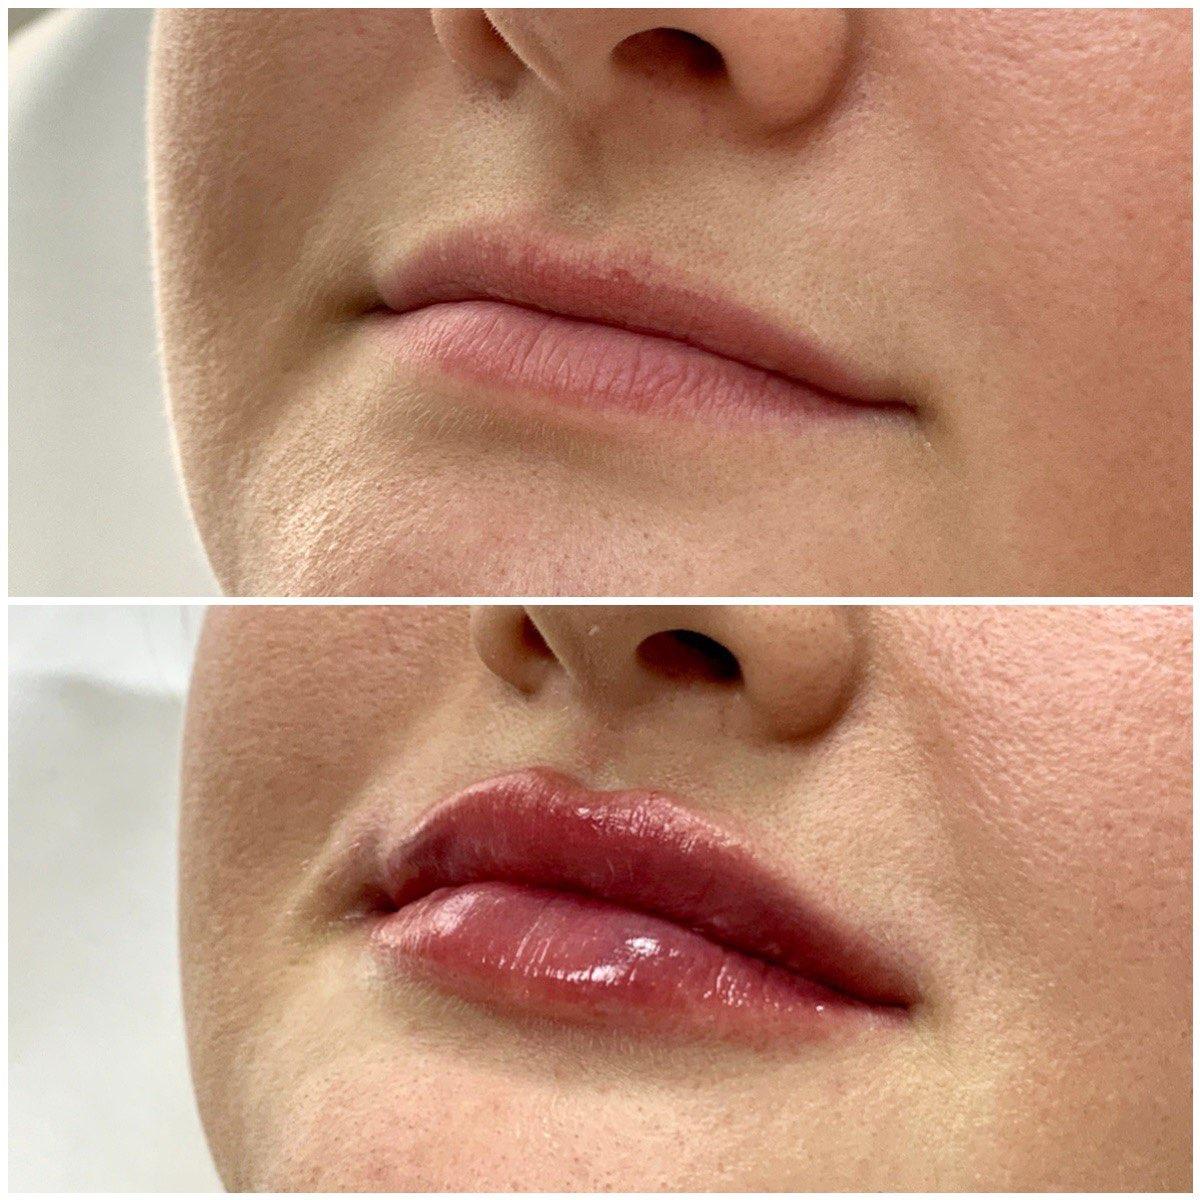 электропорация губ фото до и после для связи